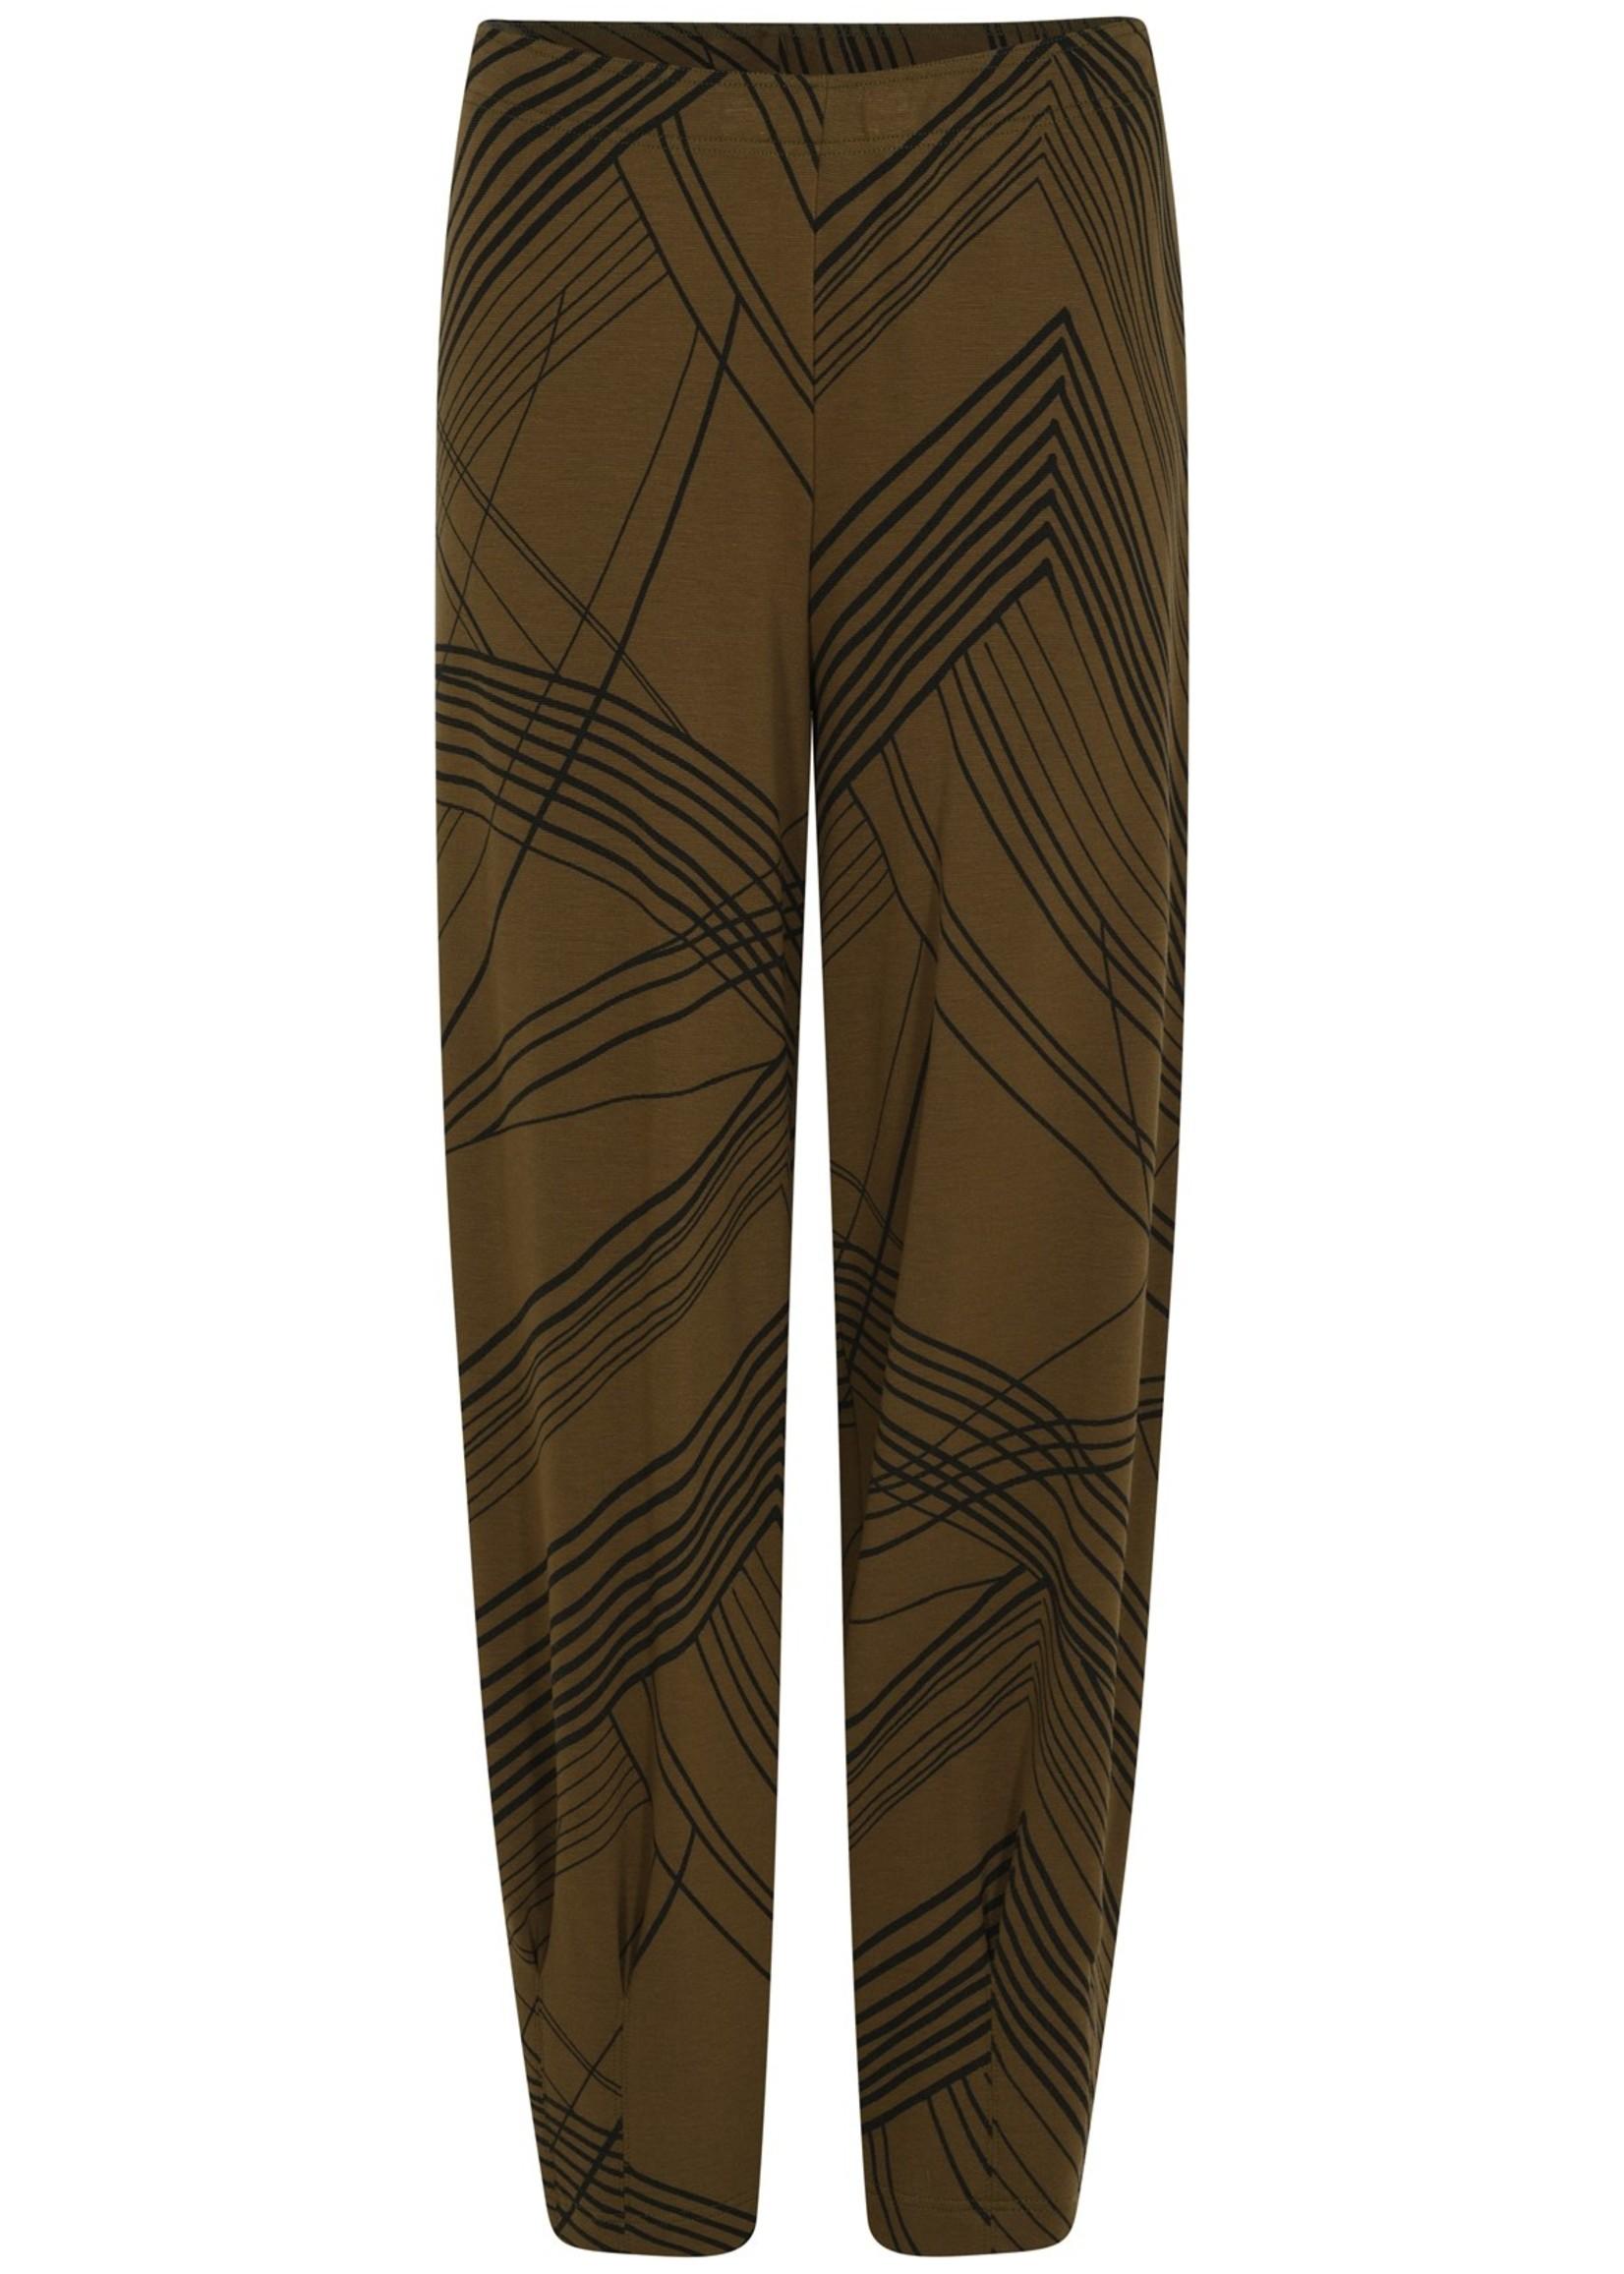 Qneel Q'neel pantalon grafische print (81839 8844)